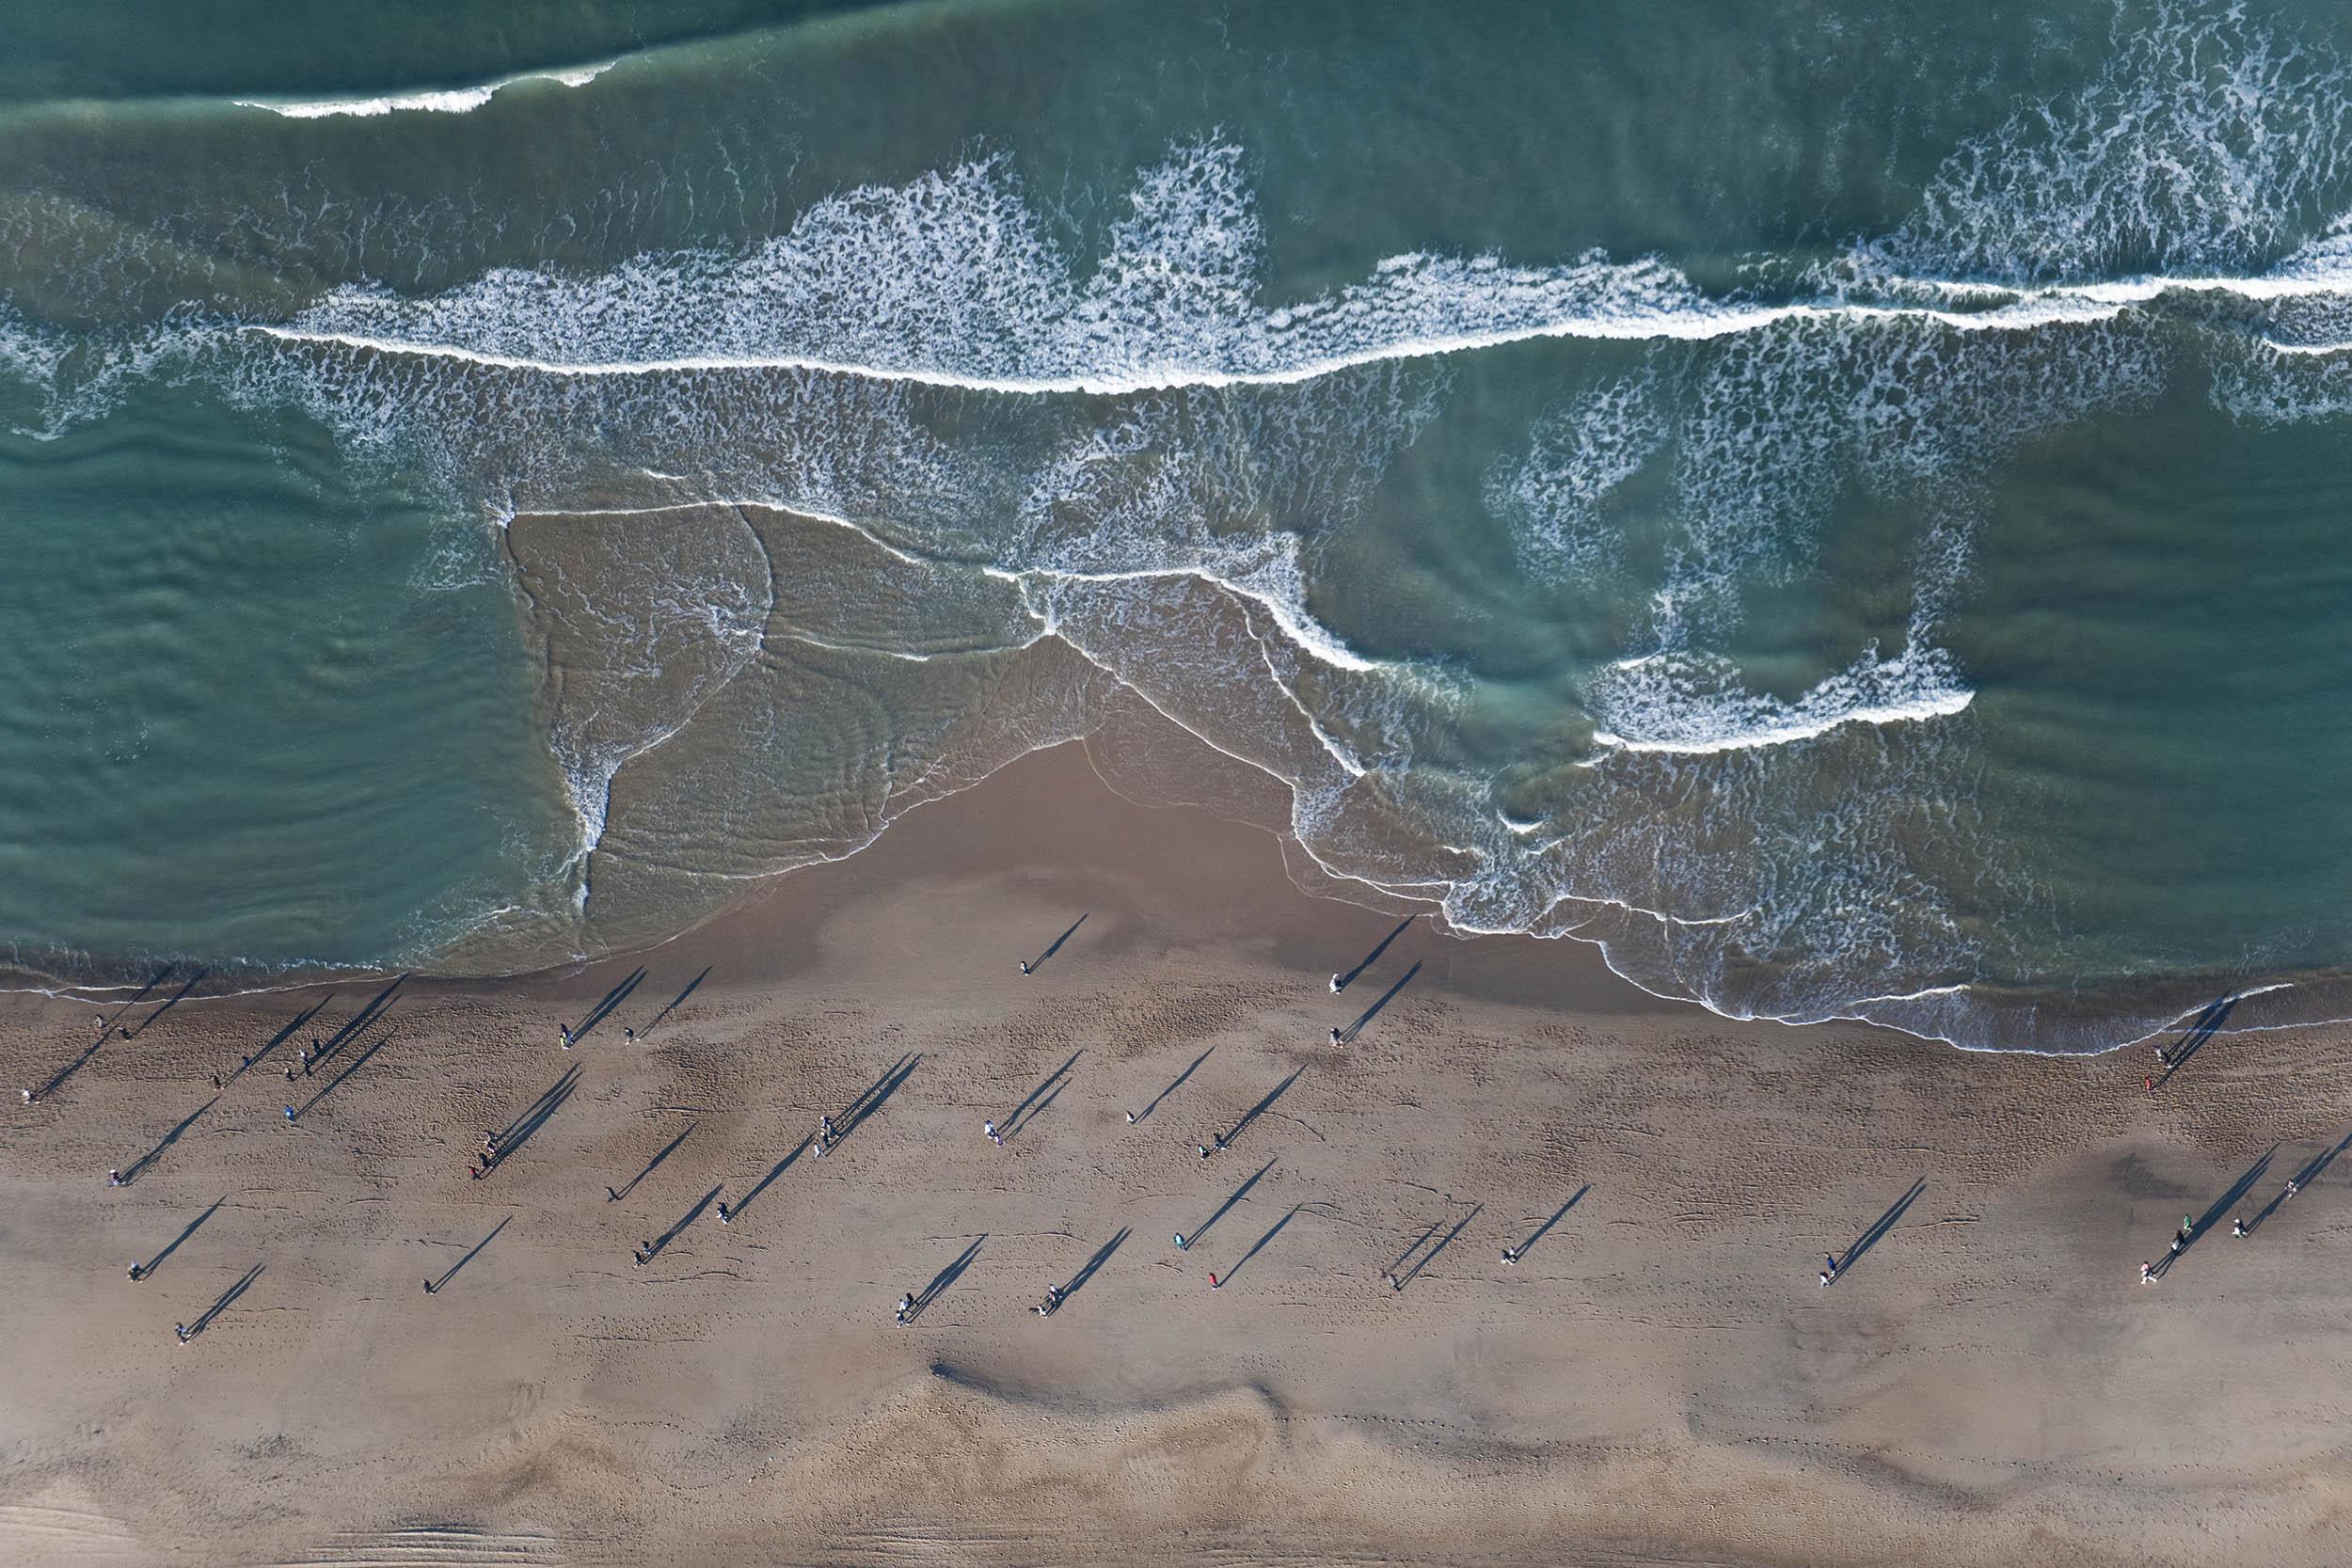 Duros de plata - Volavérunt - Hector Garrido, Aerial and human photography